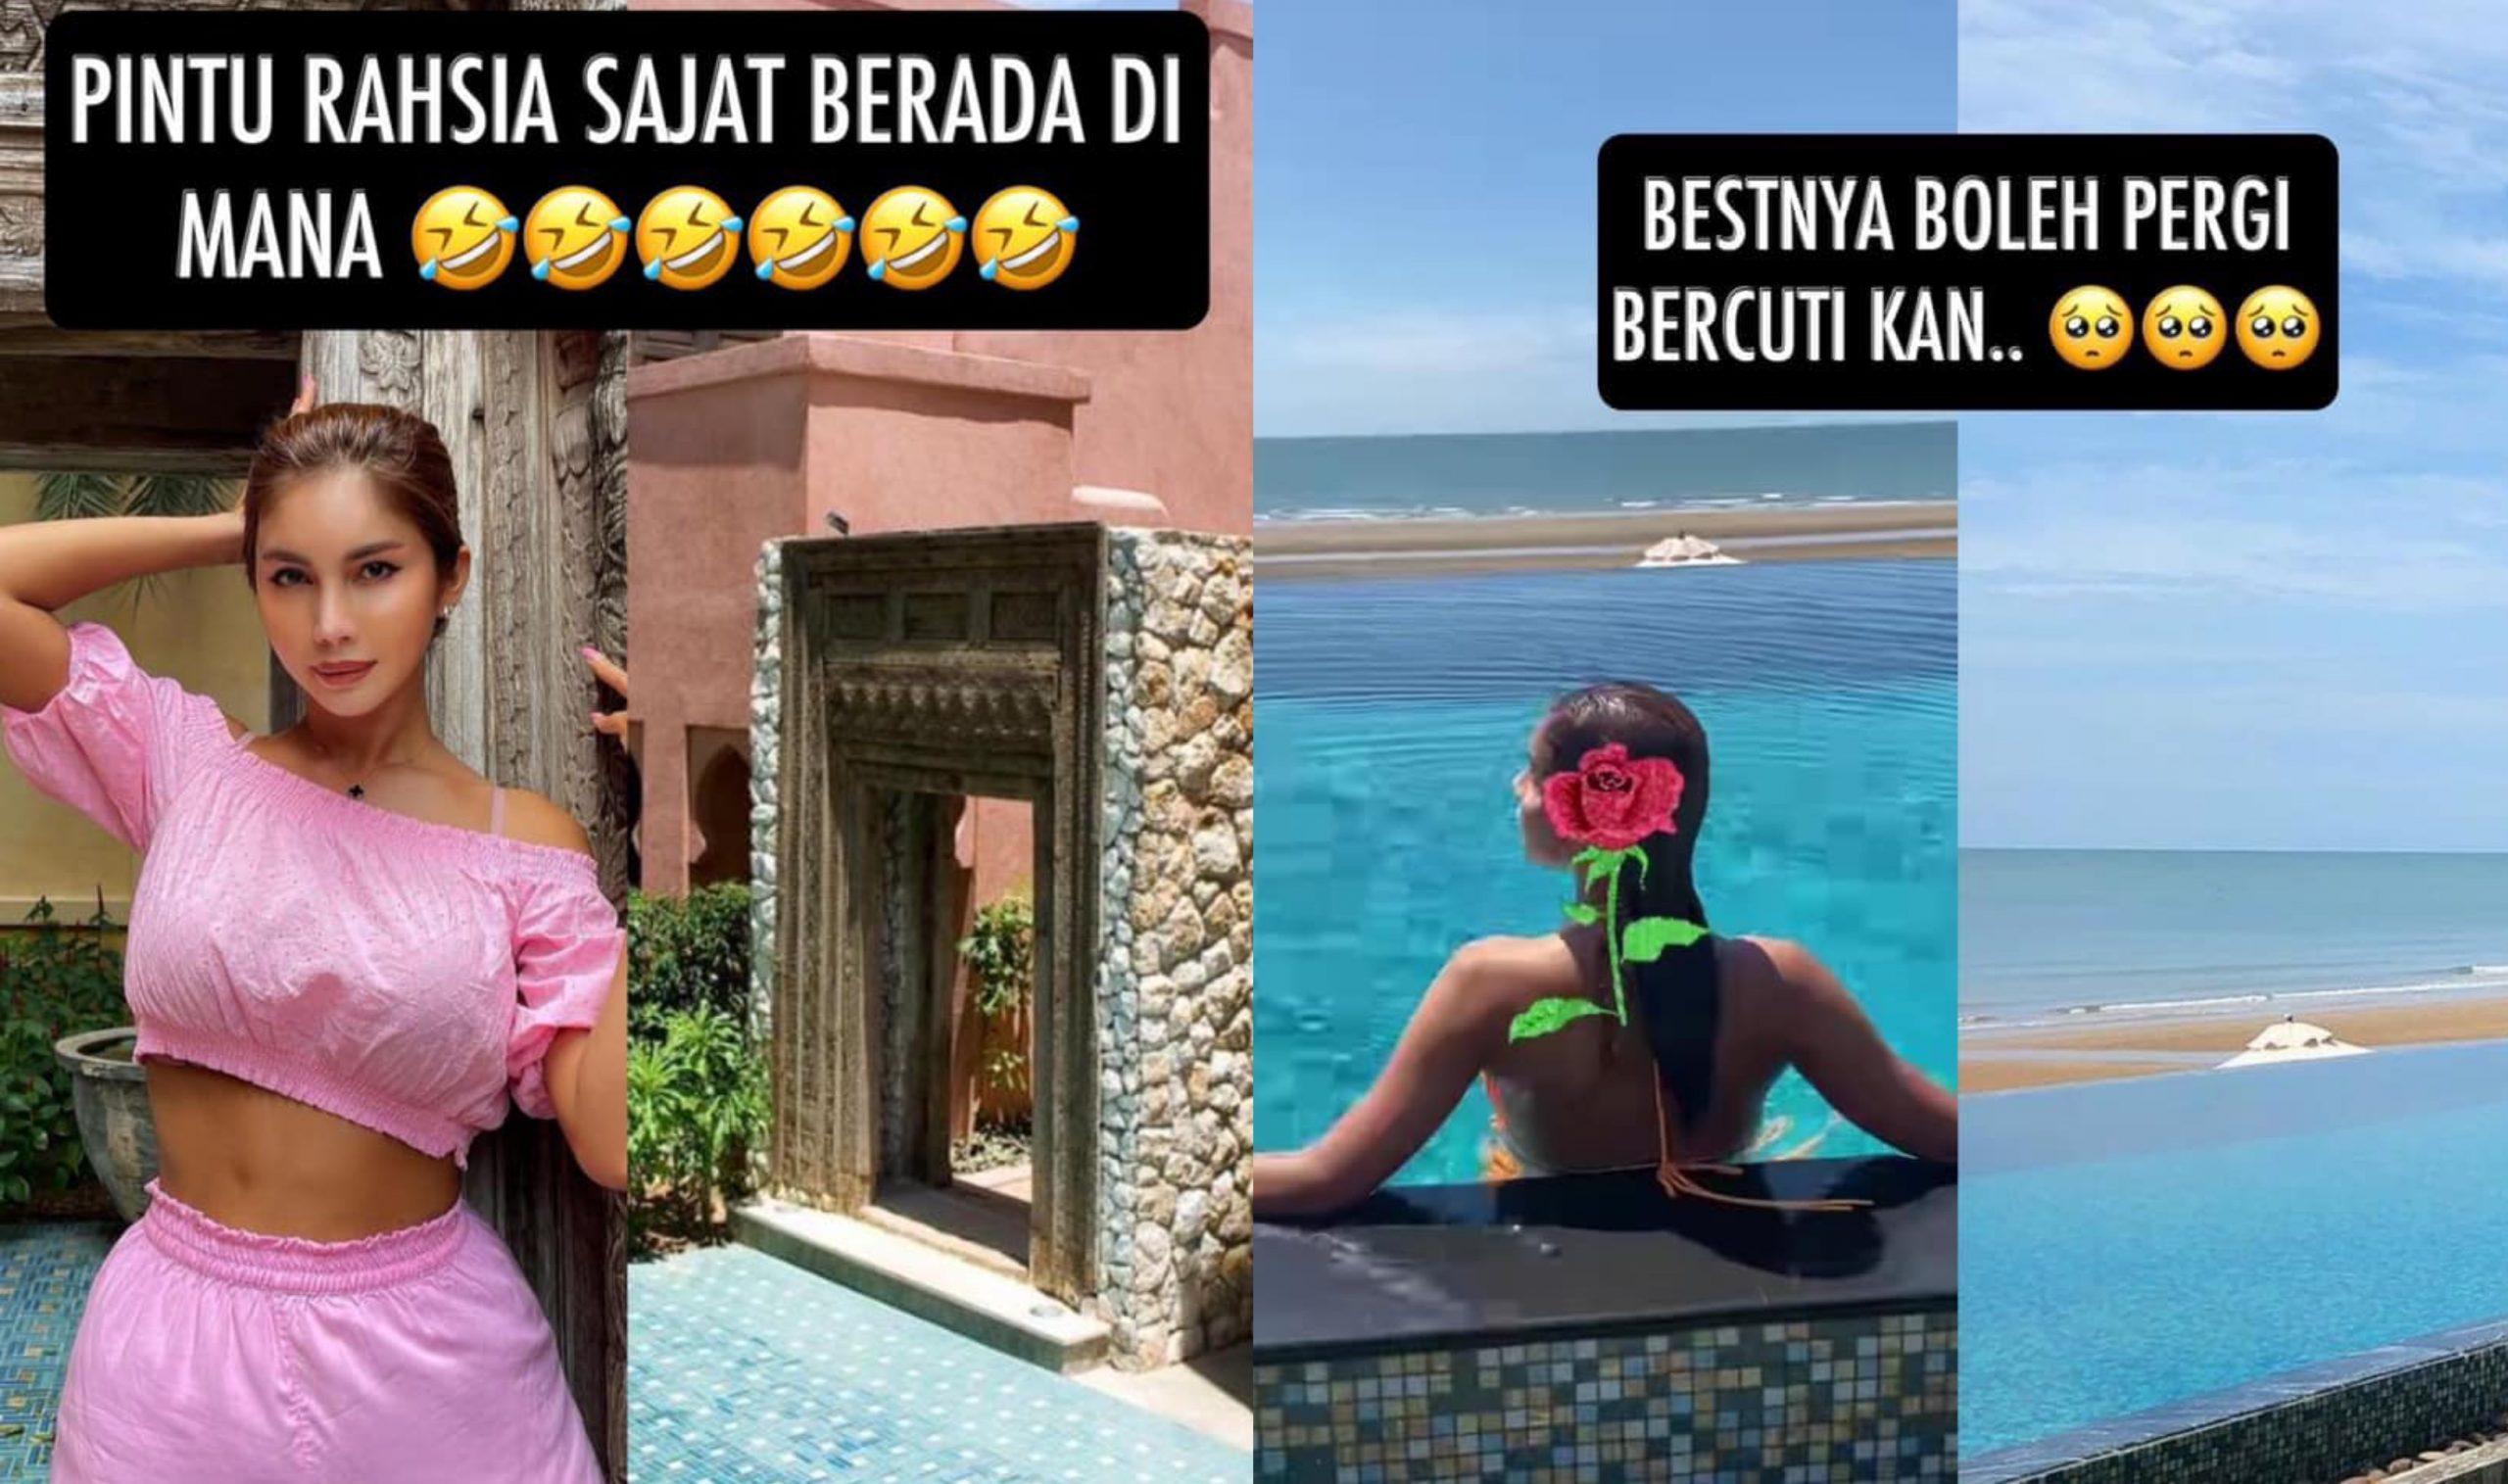 Kongsi Foto Tepi Pantai, Netizen Siasat Lokasi 'Rahsia' Sajat. Sebijik Macam Hotel Dekat… 7